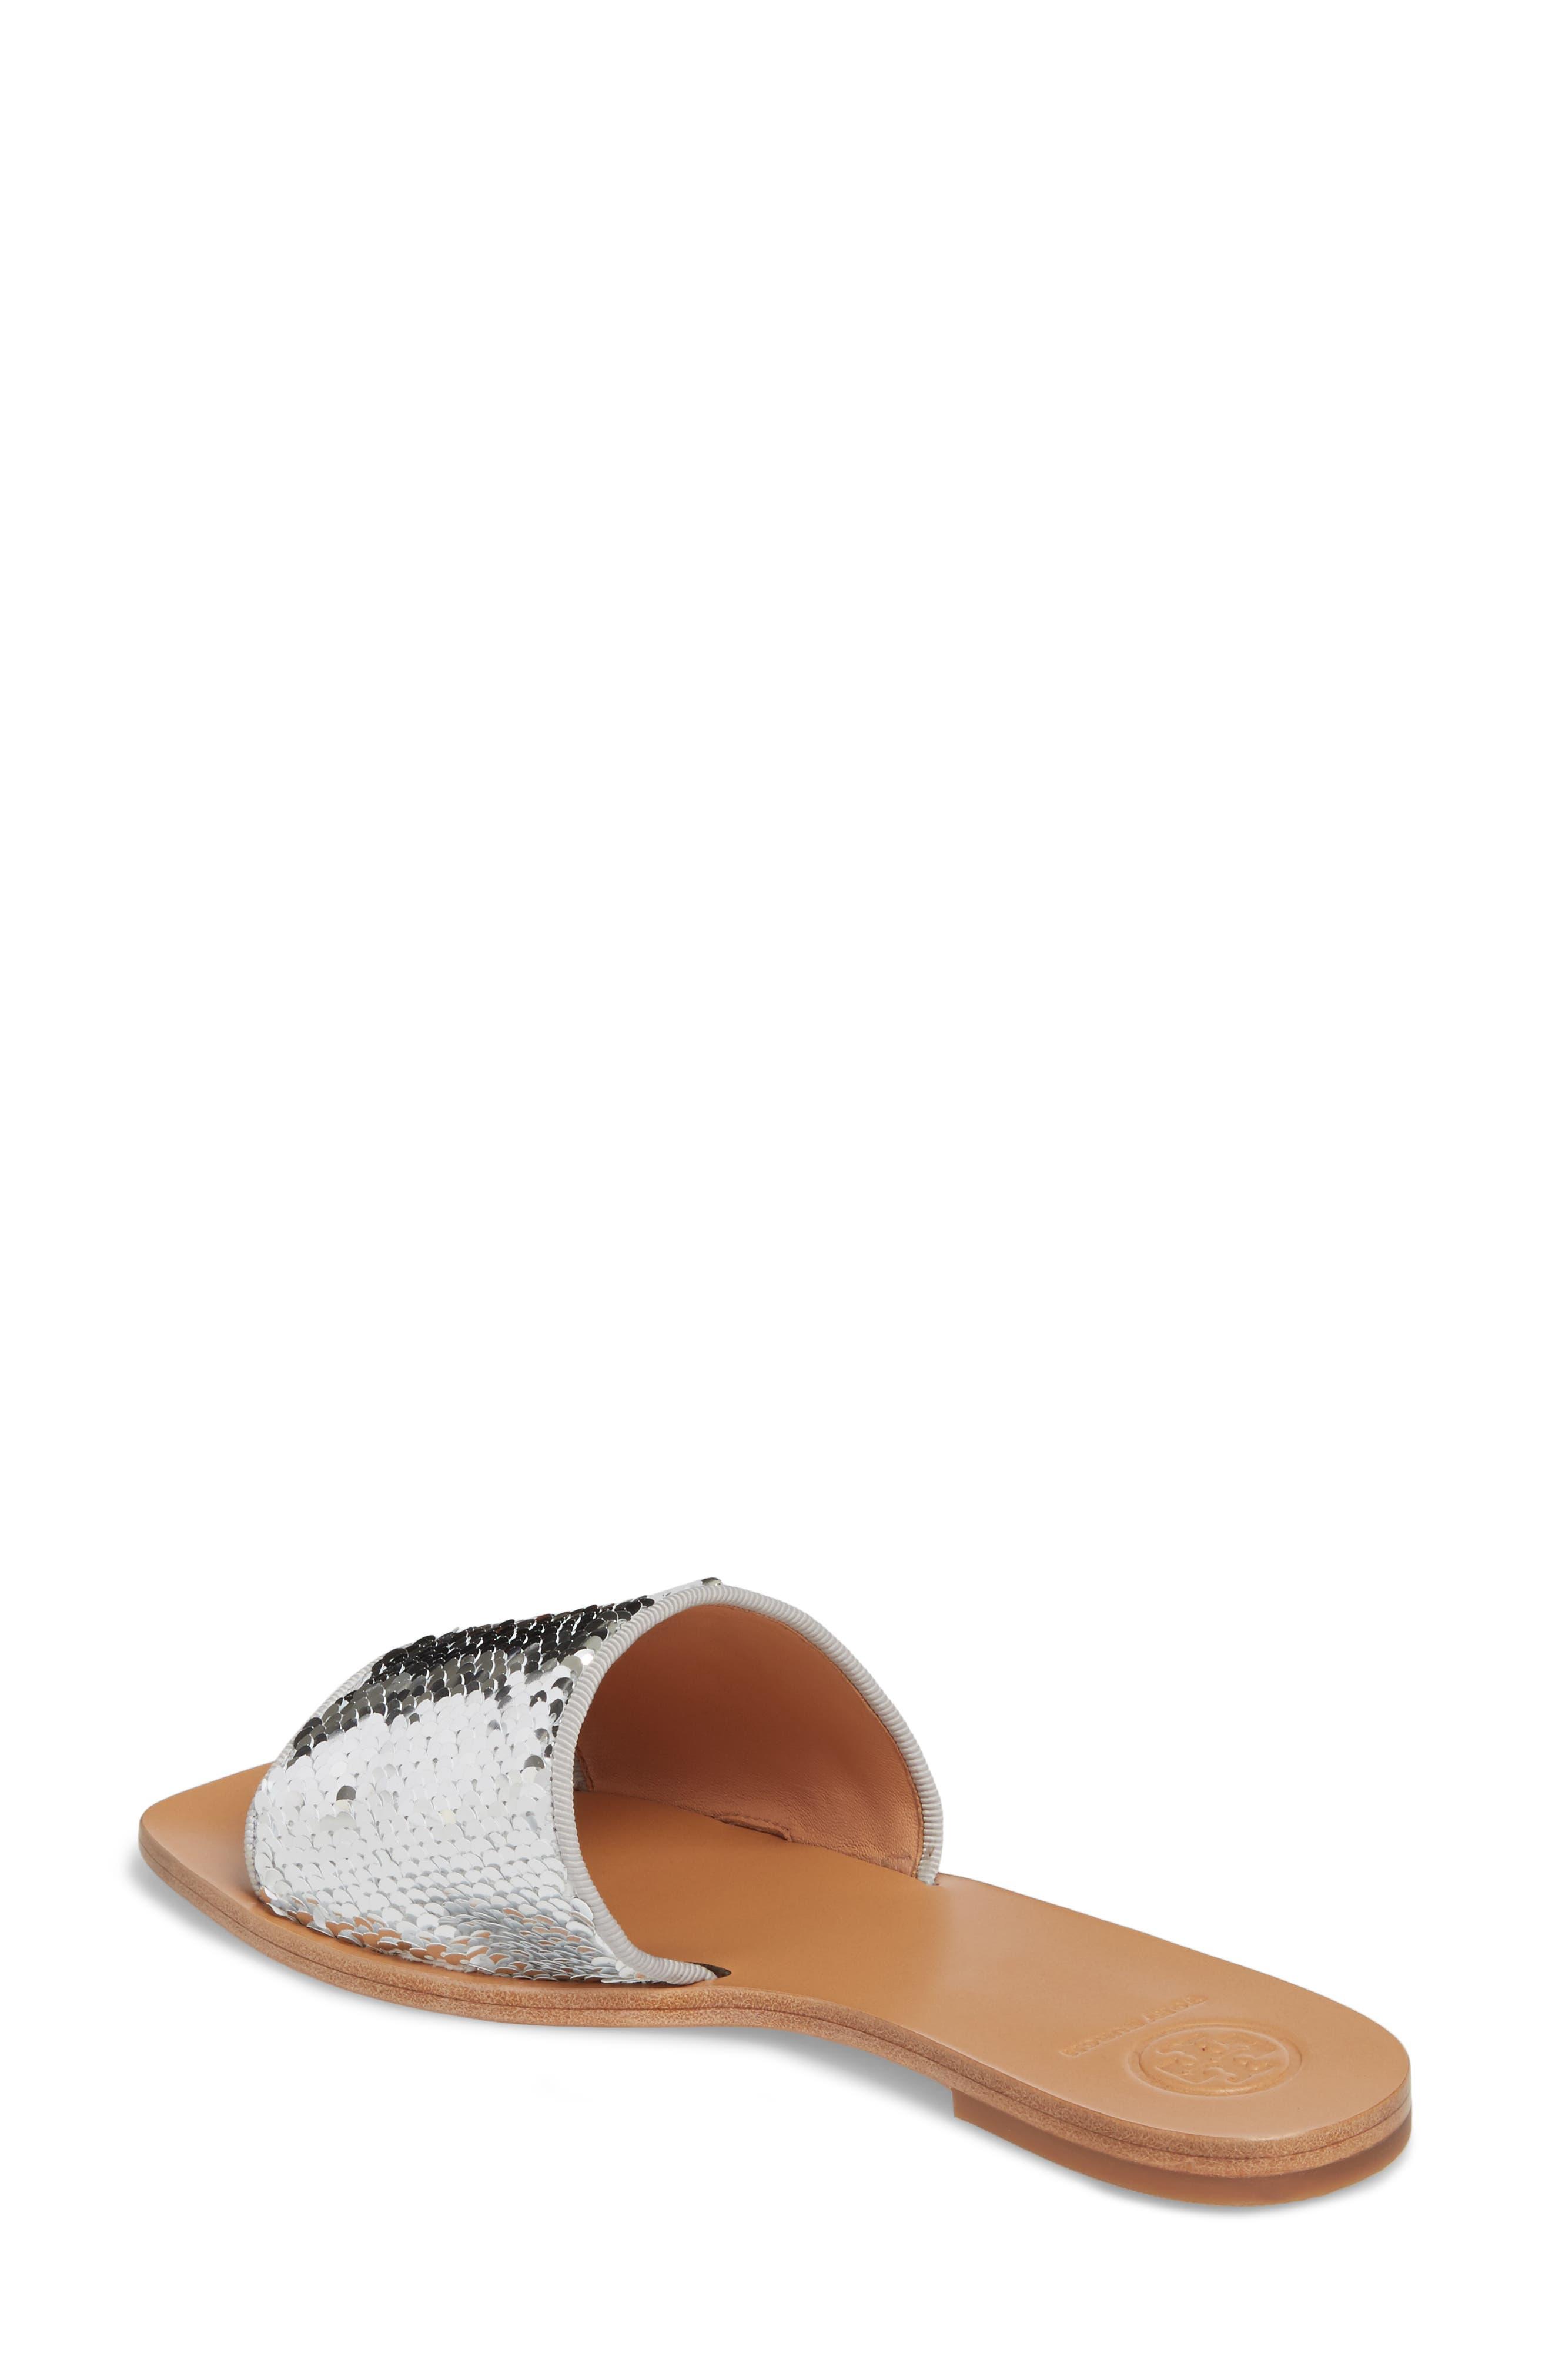 Carter Sequin Slide Sandal,                             Alternate thumbnail 2, color,                             Silver/ Perfect White